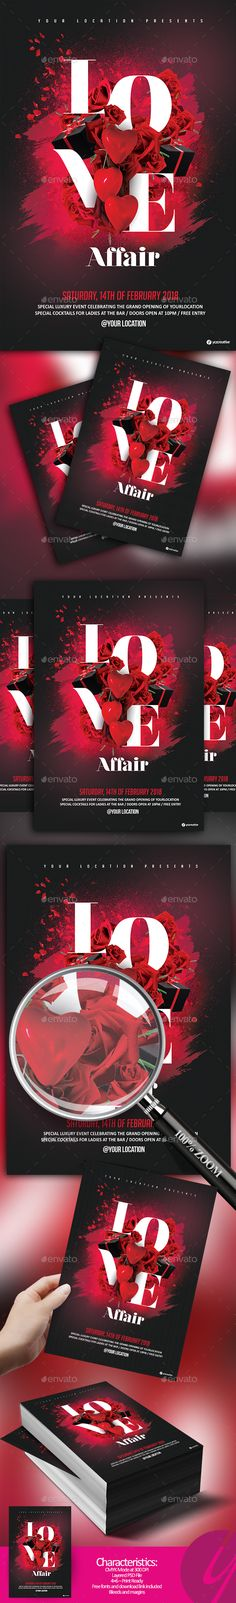 Love Affair Flyer - Clubs & Parties Events